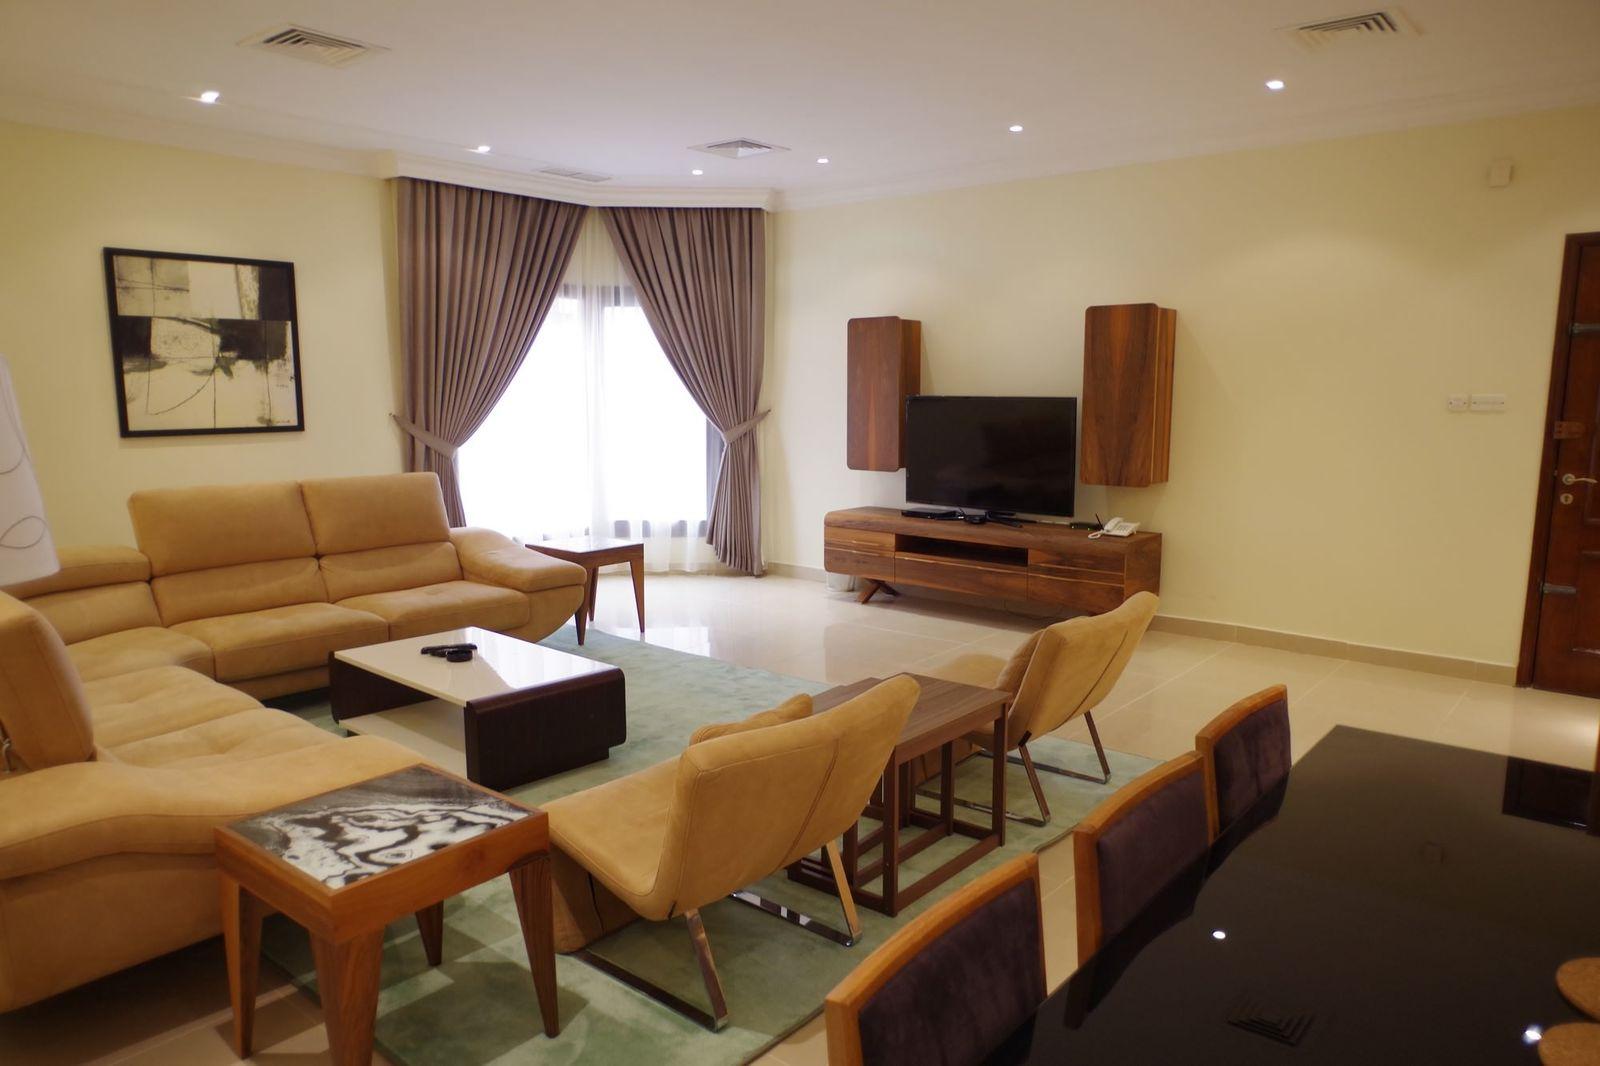 Salwa – large, furnished, three bedroom apartment w/pool